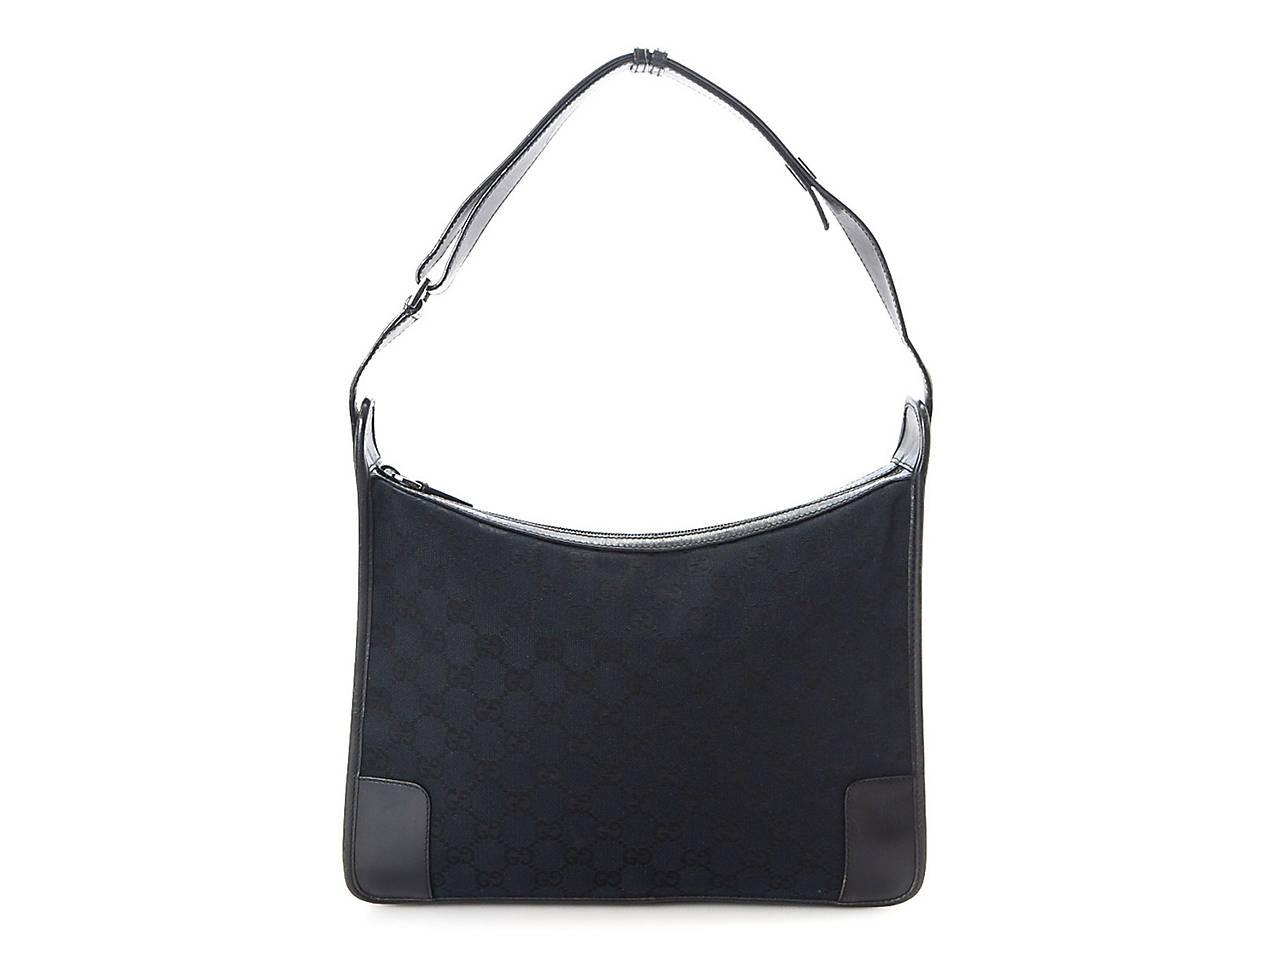 3394143b041 Gucci - Vintage Luxury GG Canvas Shoulder Bag Women s Handbags ...